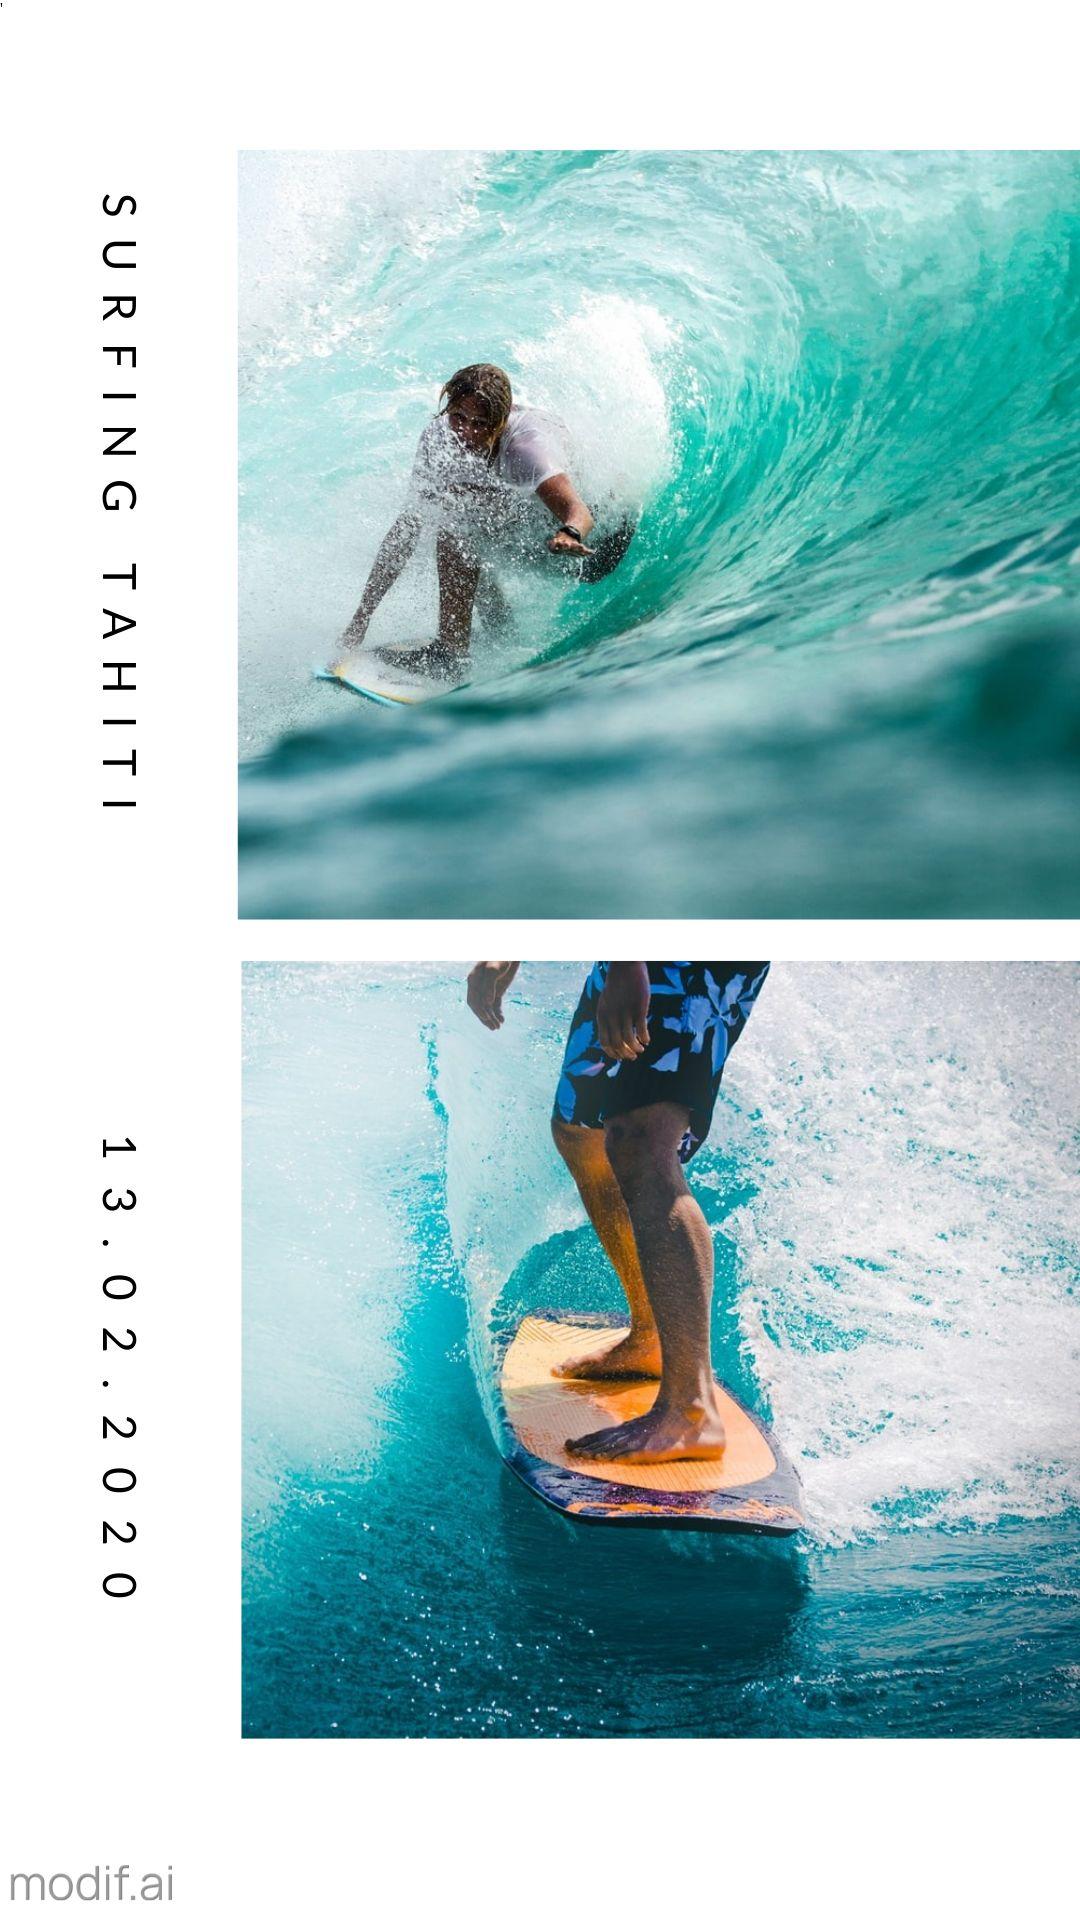 Surfing Tahiti Instagram Story Maker